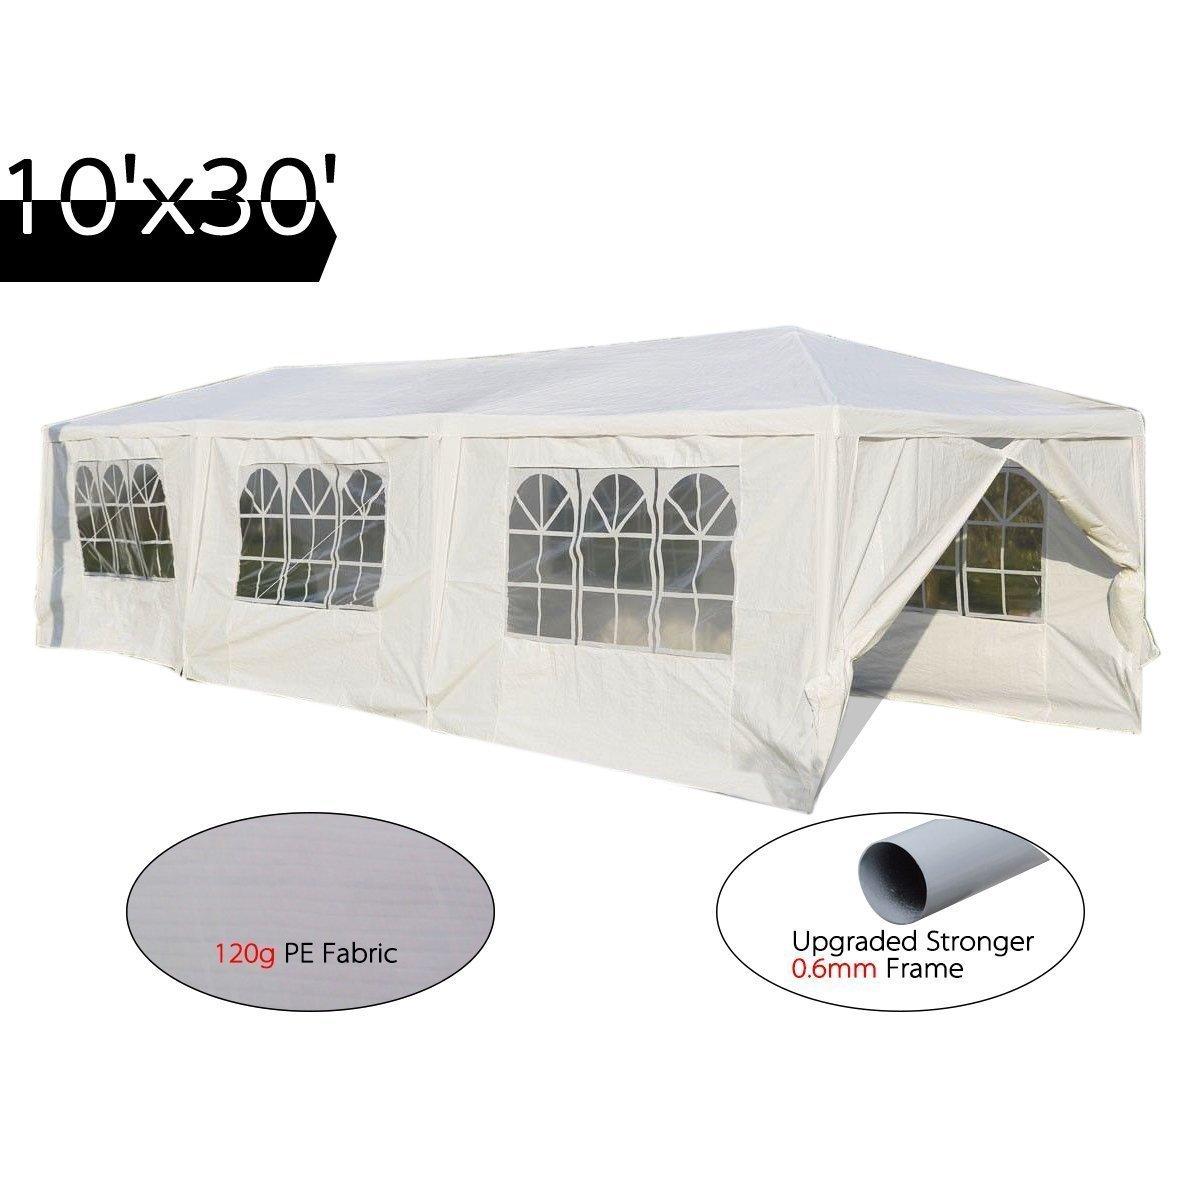 Peaktop 10'x30' Heavy Duty Outdoor Party Wedding Tent Canopy Gazebo Storage Shelter Pavilion.